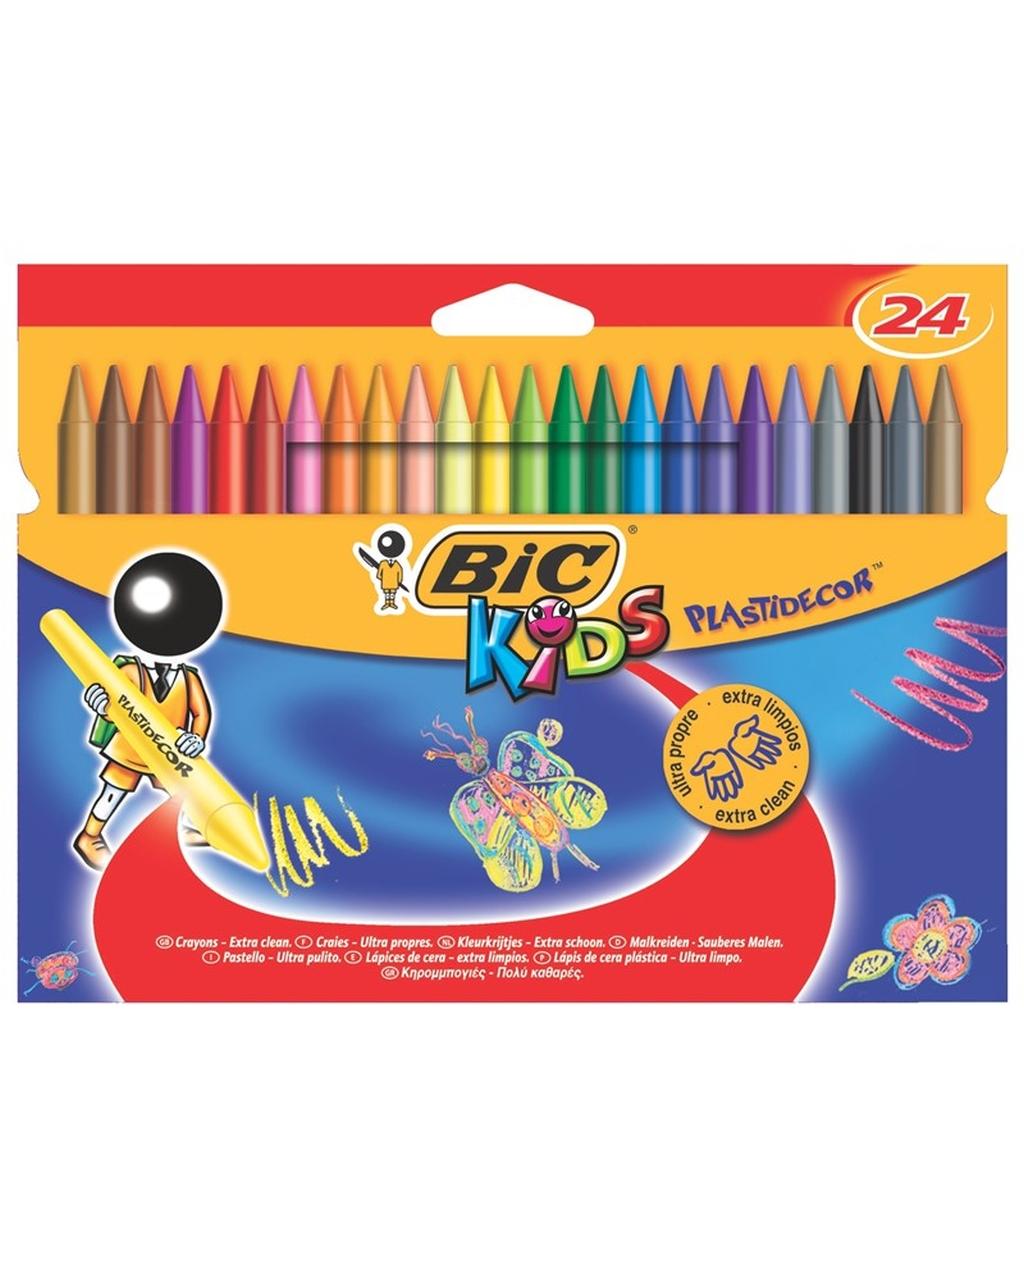 Plastidecor Plastic Crayons